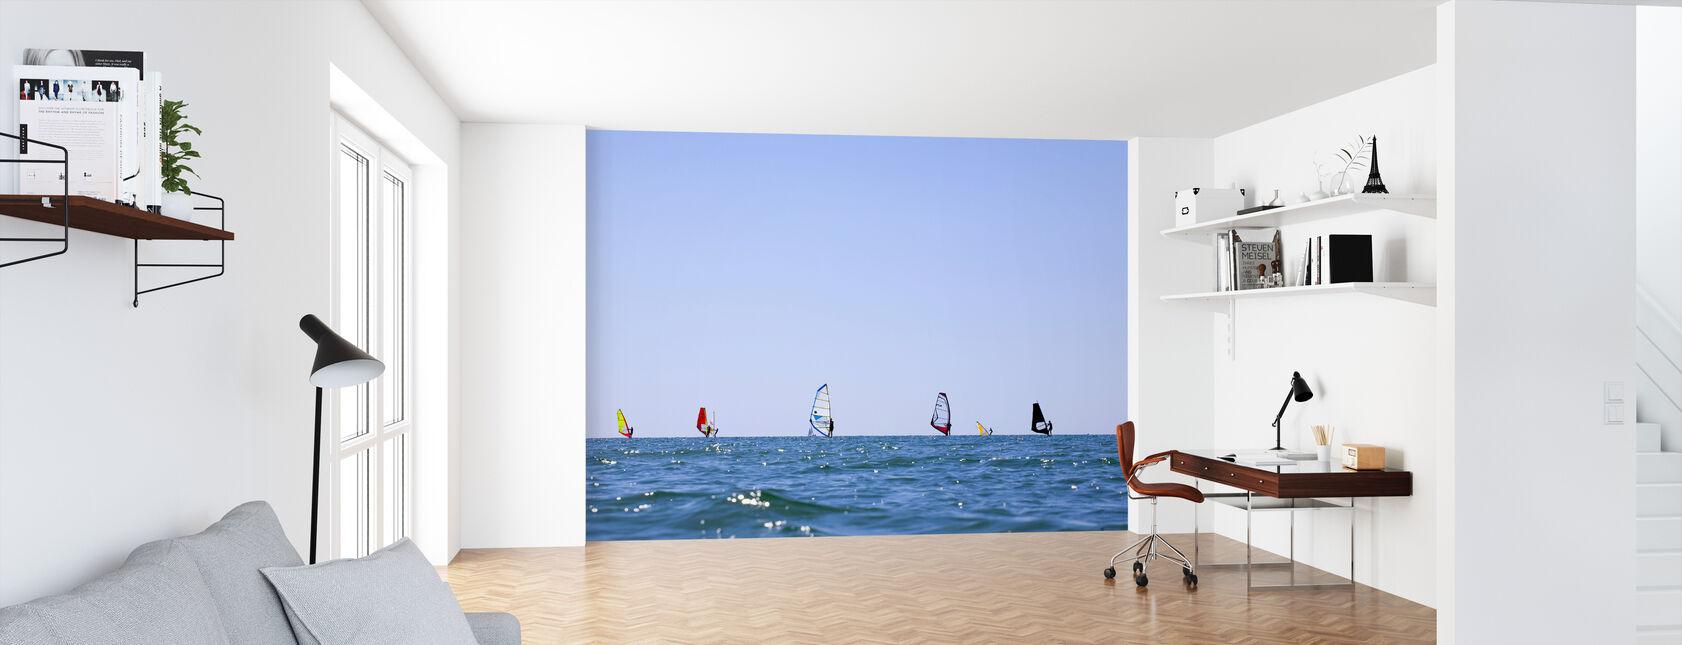 Windsurfing in Varberg, Sweden - Wallpaper - Office